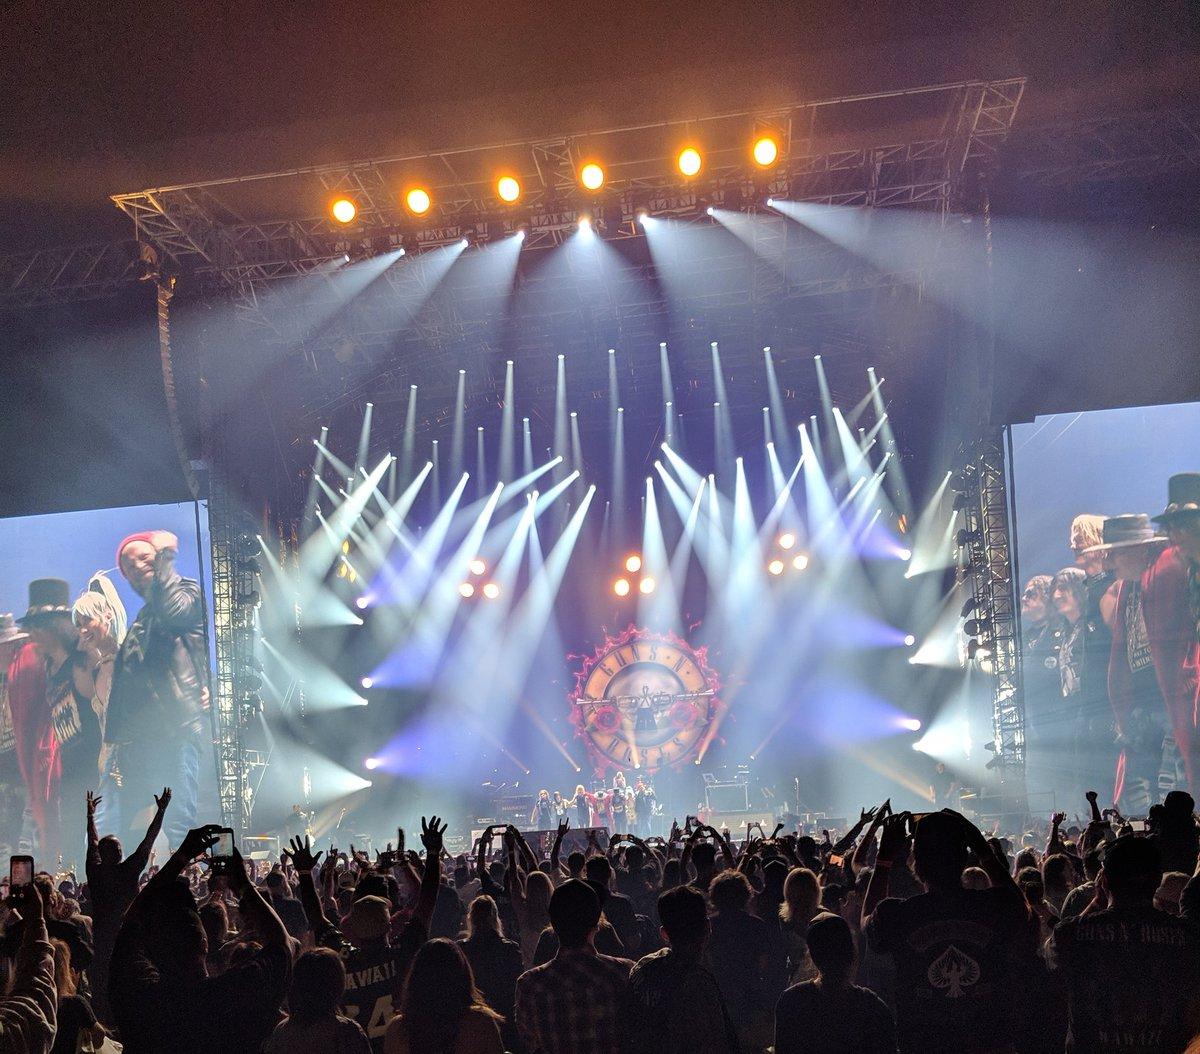 Still riding on that Guns N' Roses high #gnrinhawaii